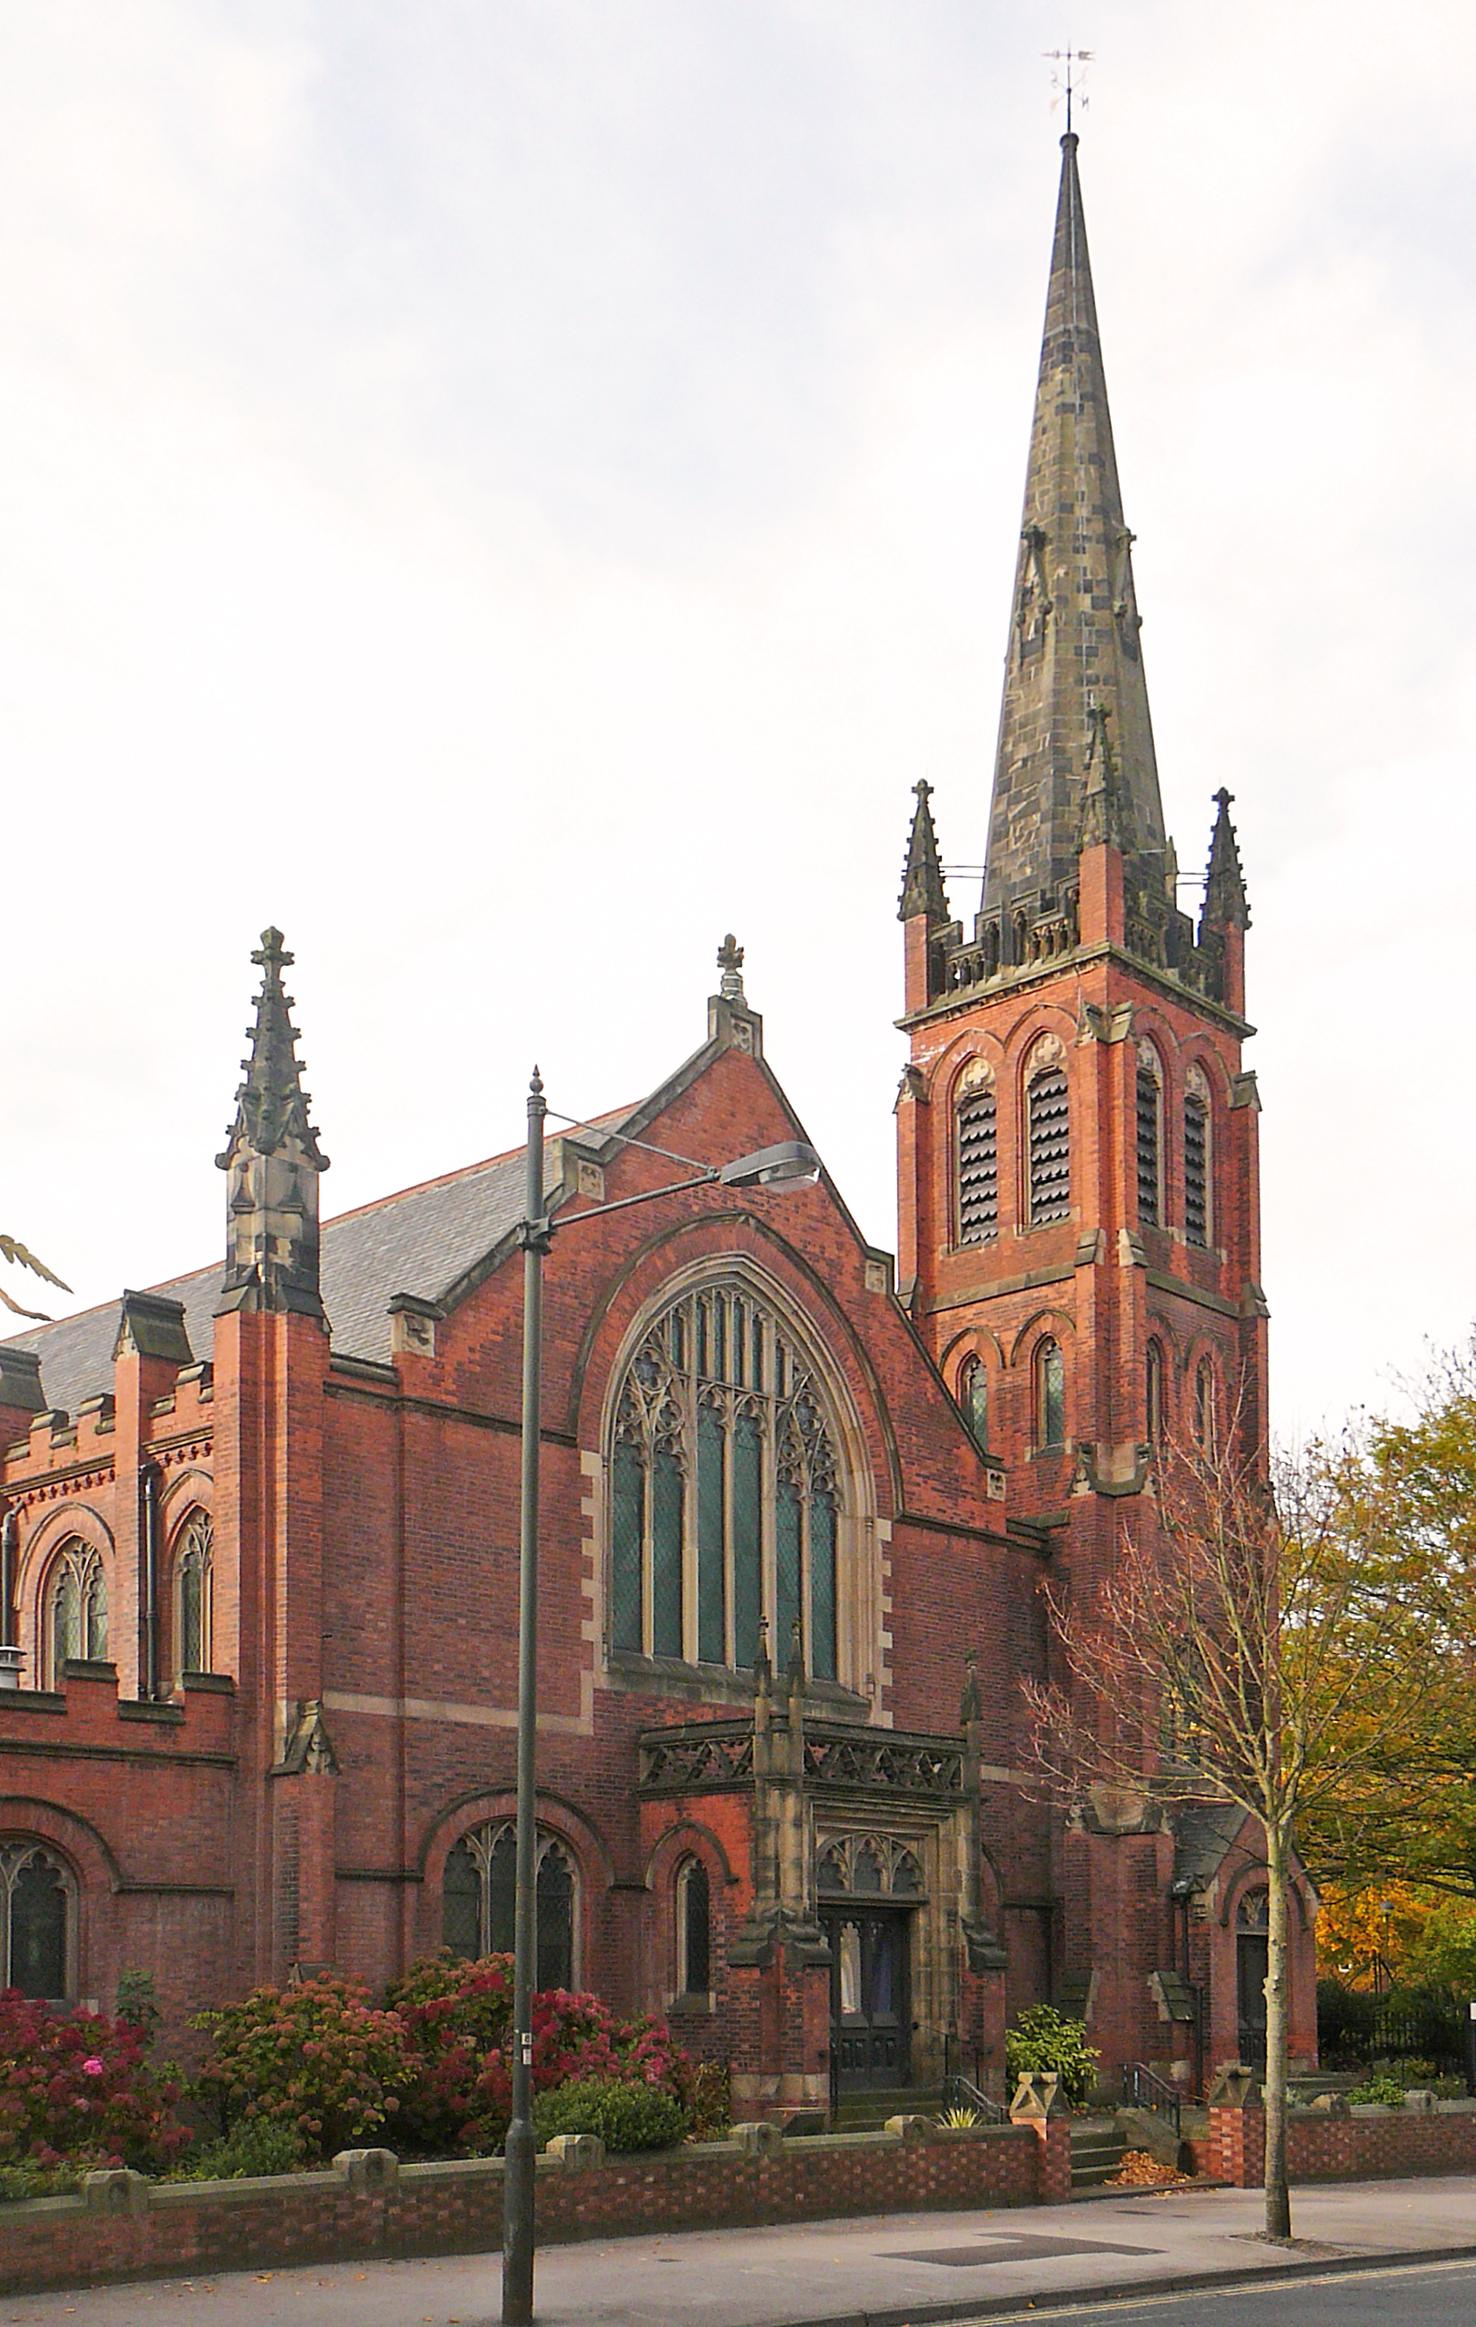 File:Methodist Church, Clifton, York, England - 20101030.jpg